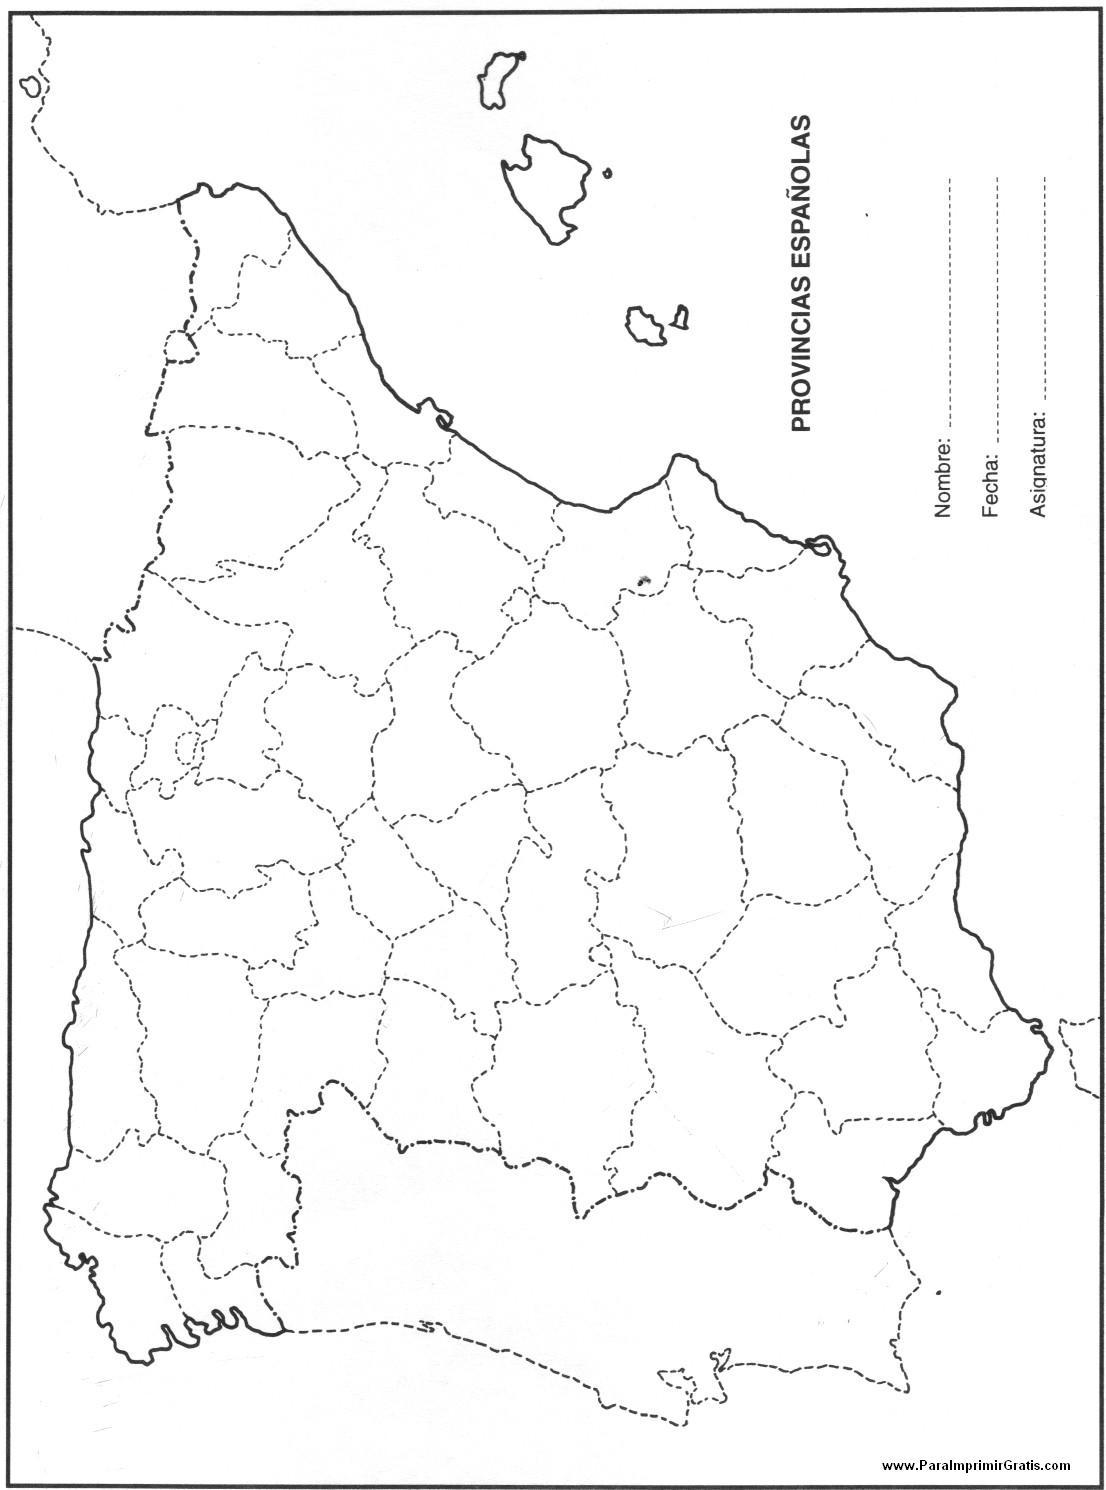 Mapa De España Colorear.Mapa De Provincias De Espana Para Imprimir Gratis